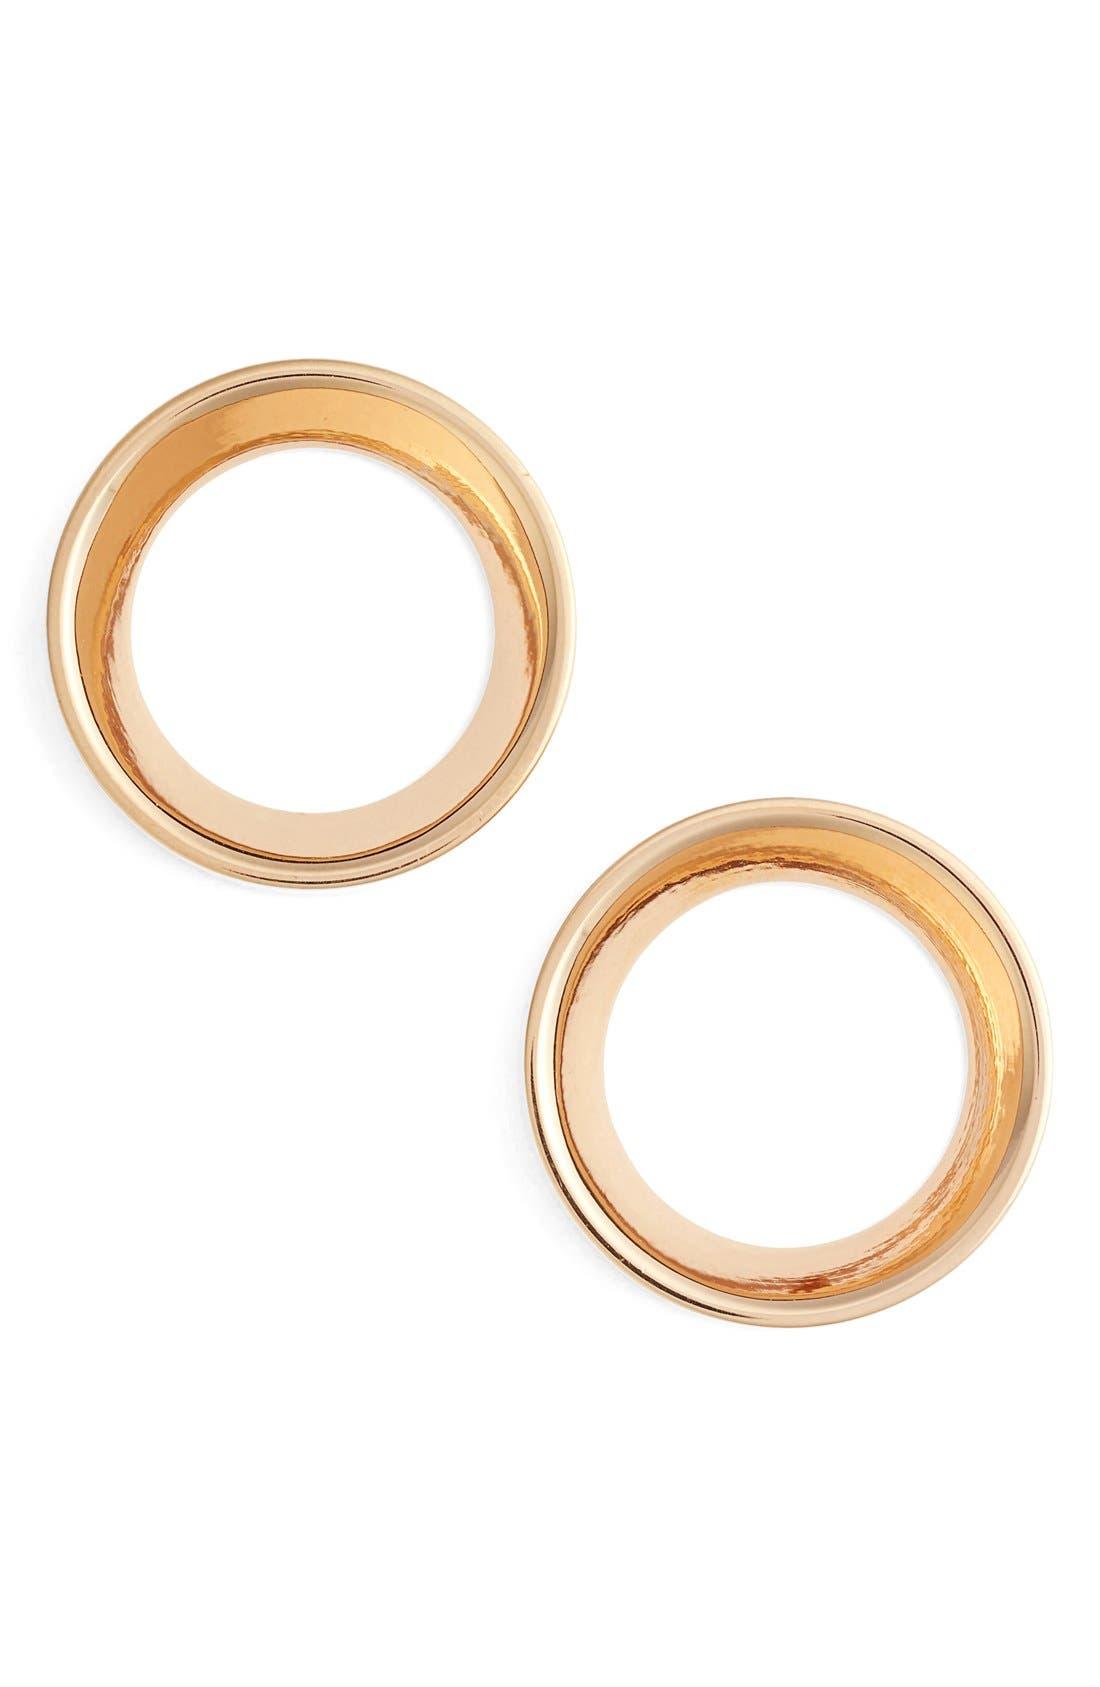 VITA FEDE Mini Cosimo Frontal Hoop Earrings